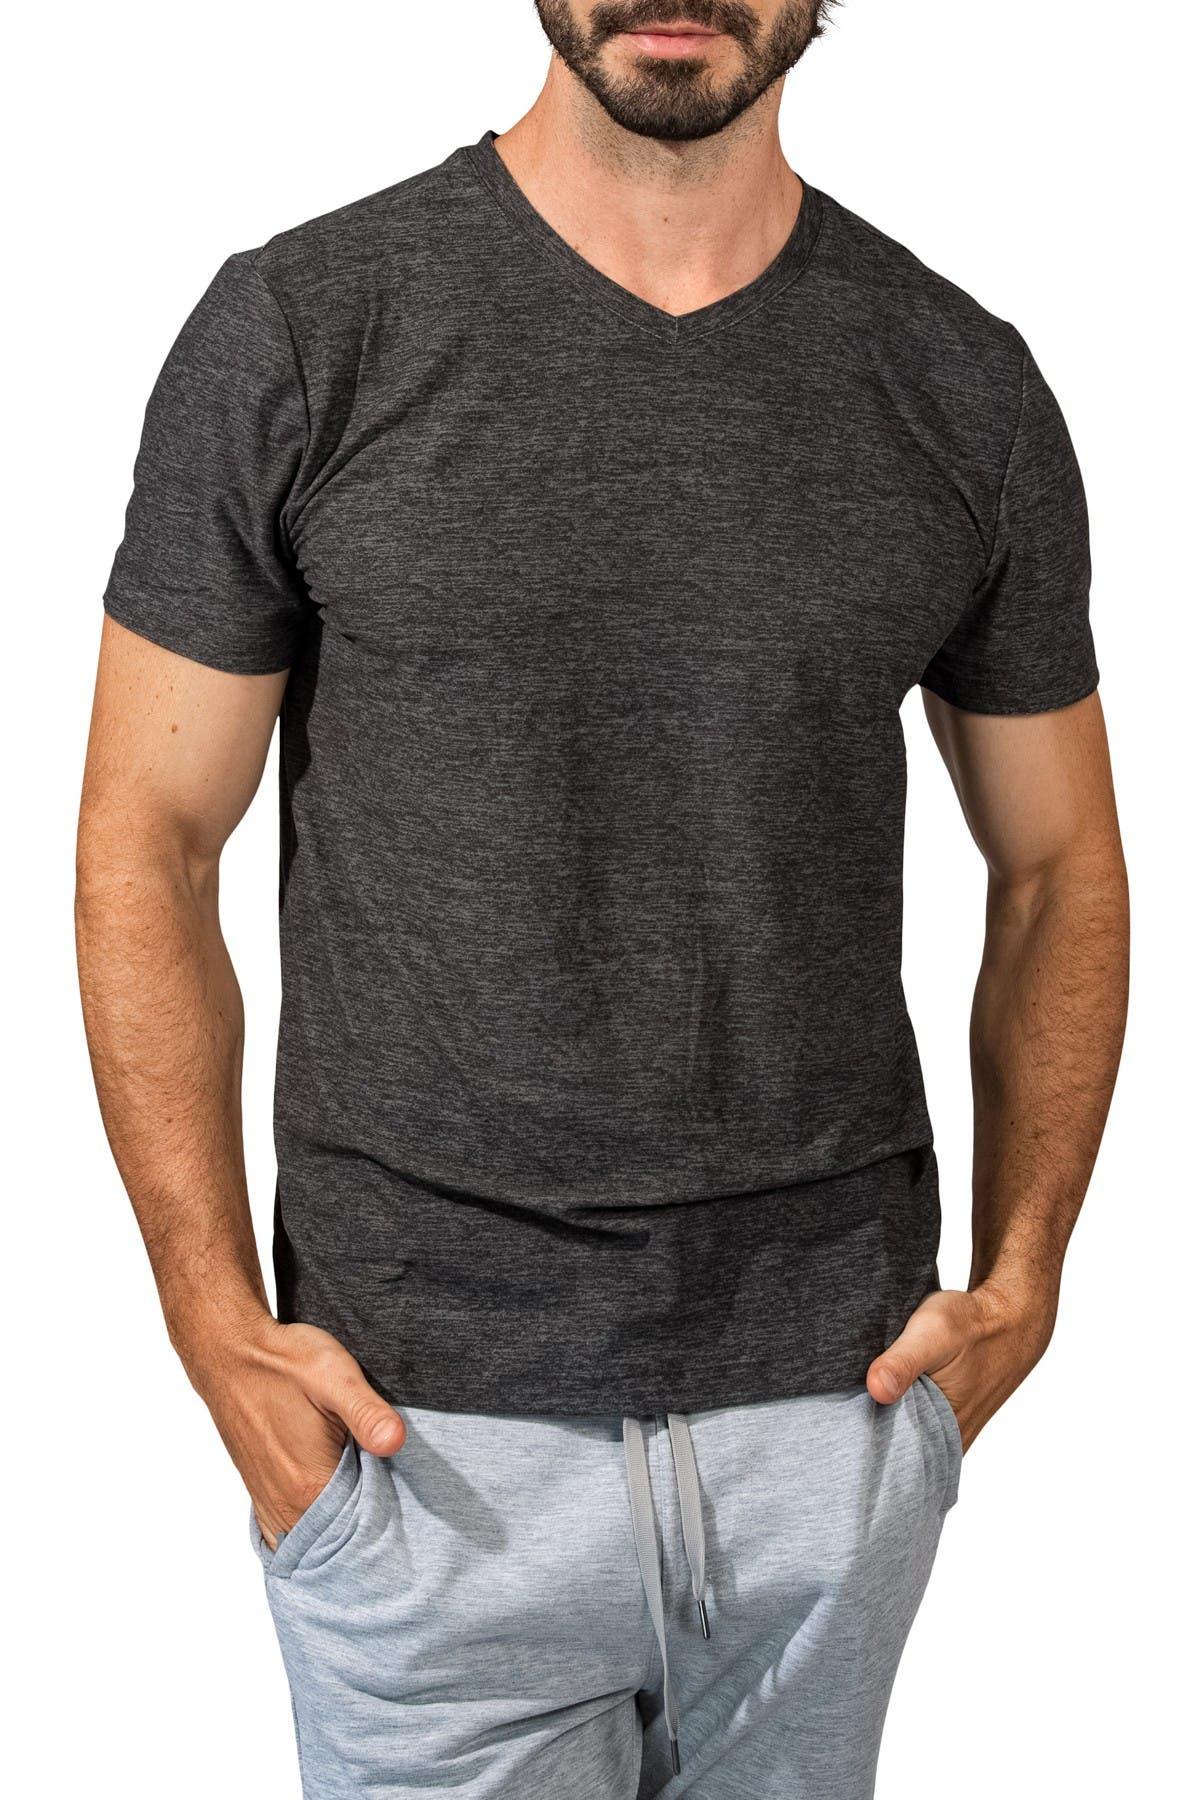 Image of 90 Degree By Reflex V-Neck Short Sleeve T-Shirt